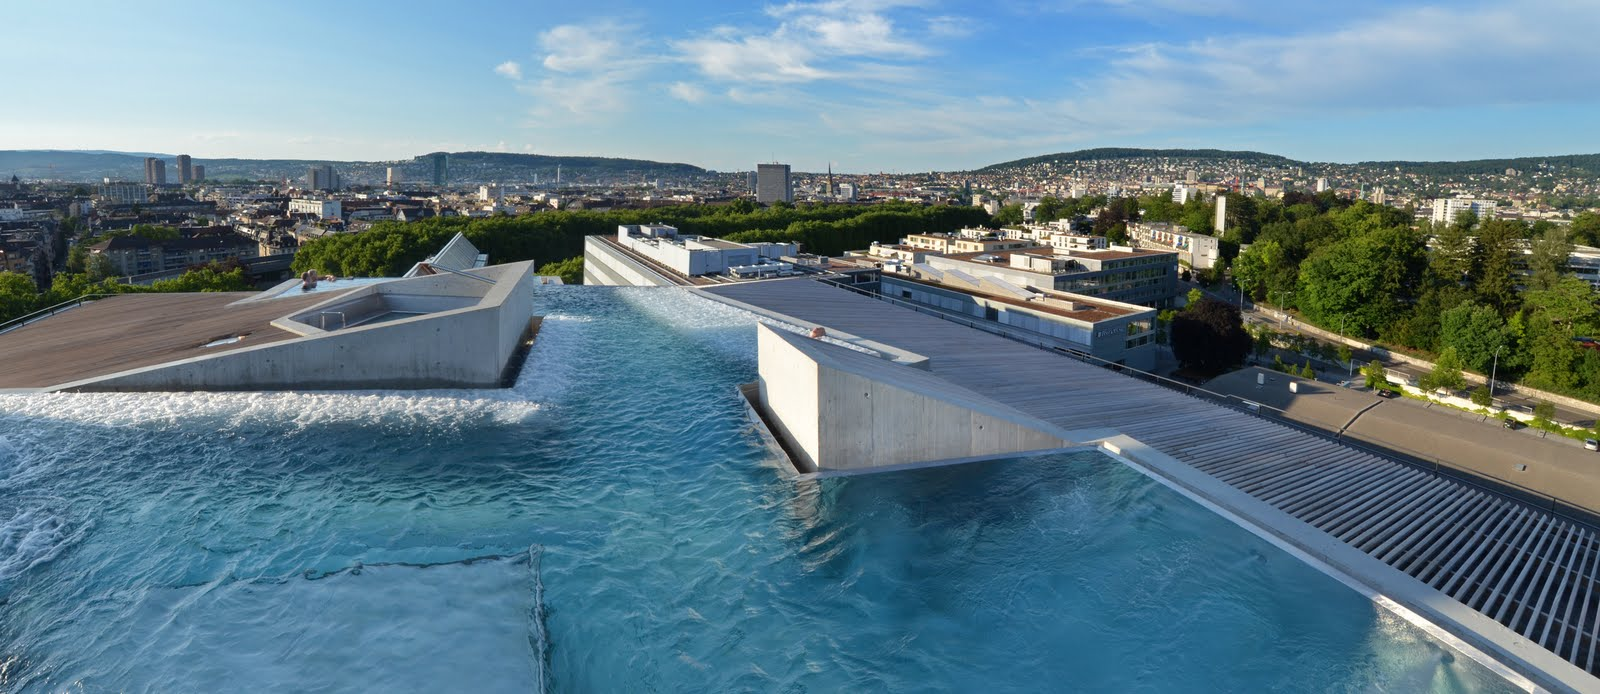 Studieren in z rich thermalbad und spa z rich for Hotel nice piscine sur le toit